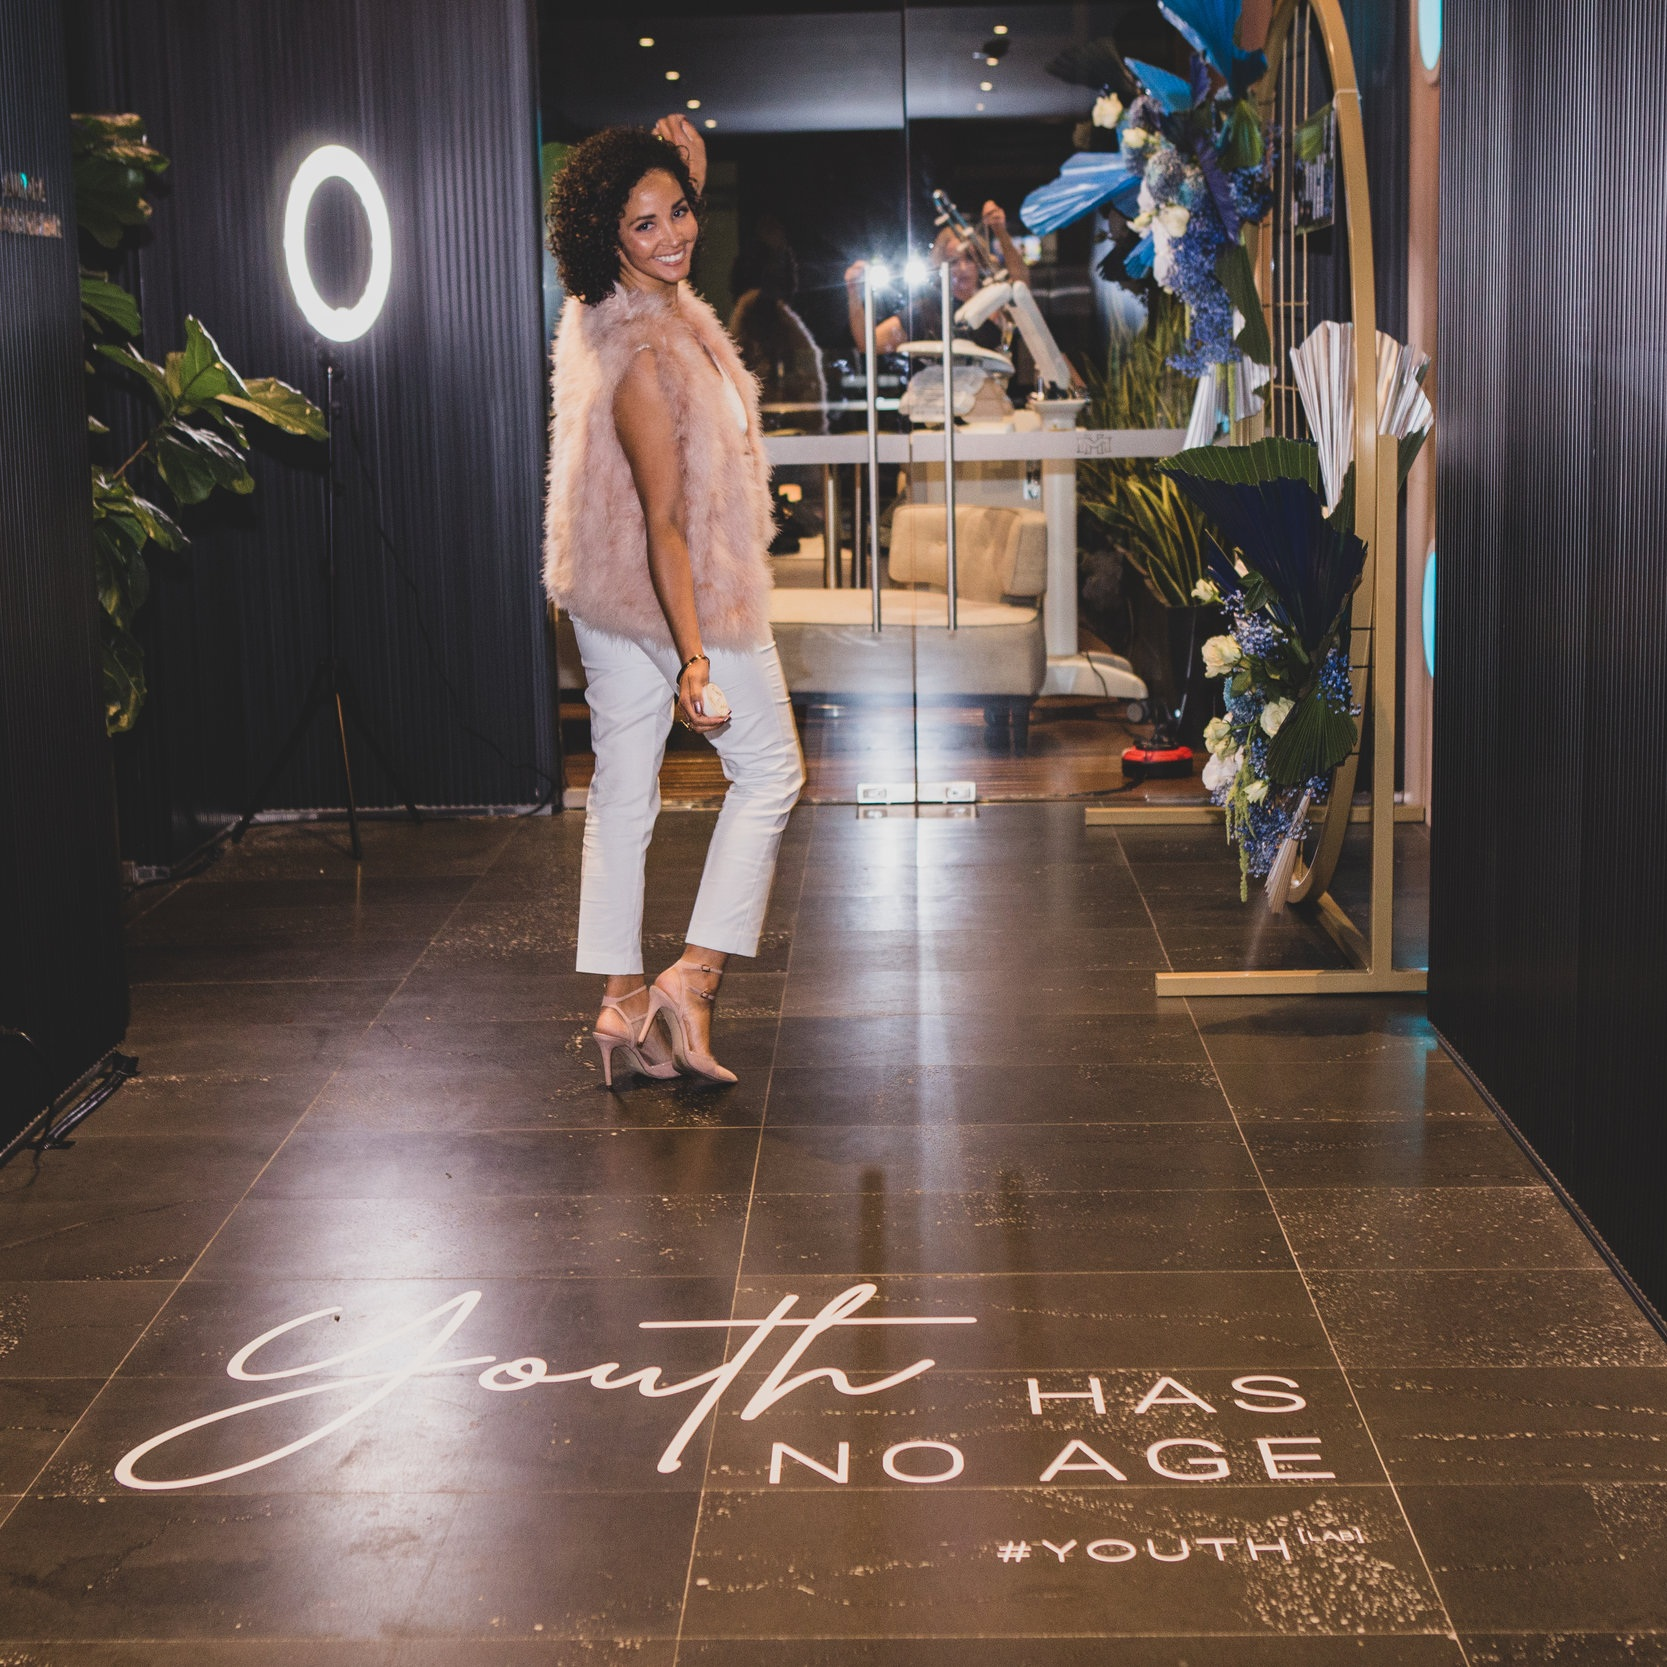 Showcase - Event Management Perth, Perth PR, Known